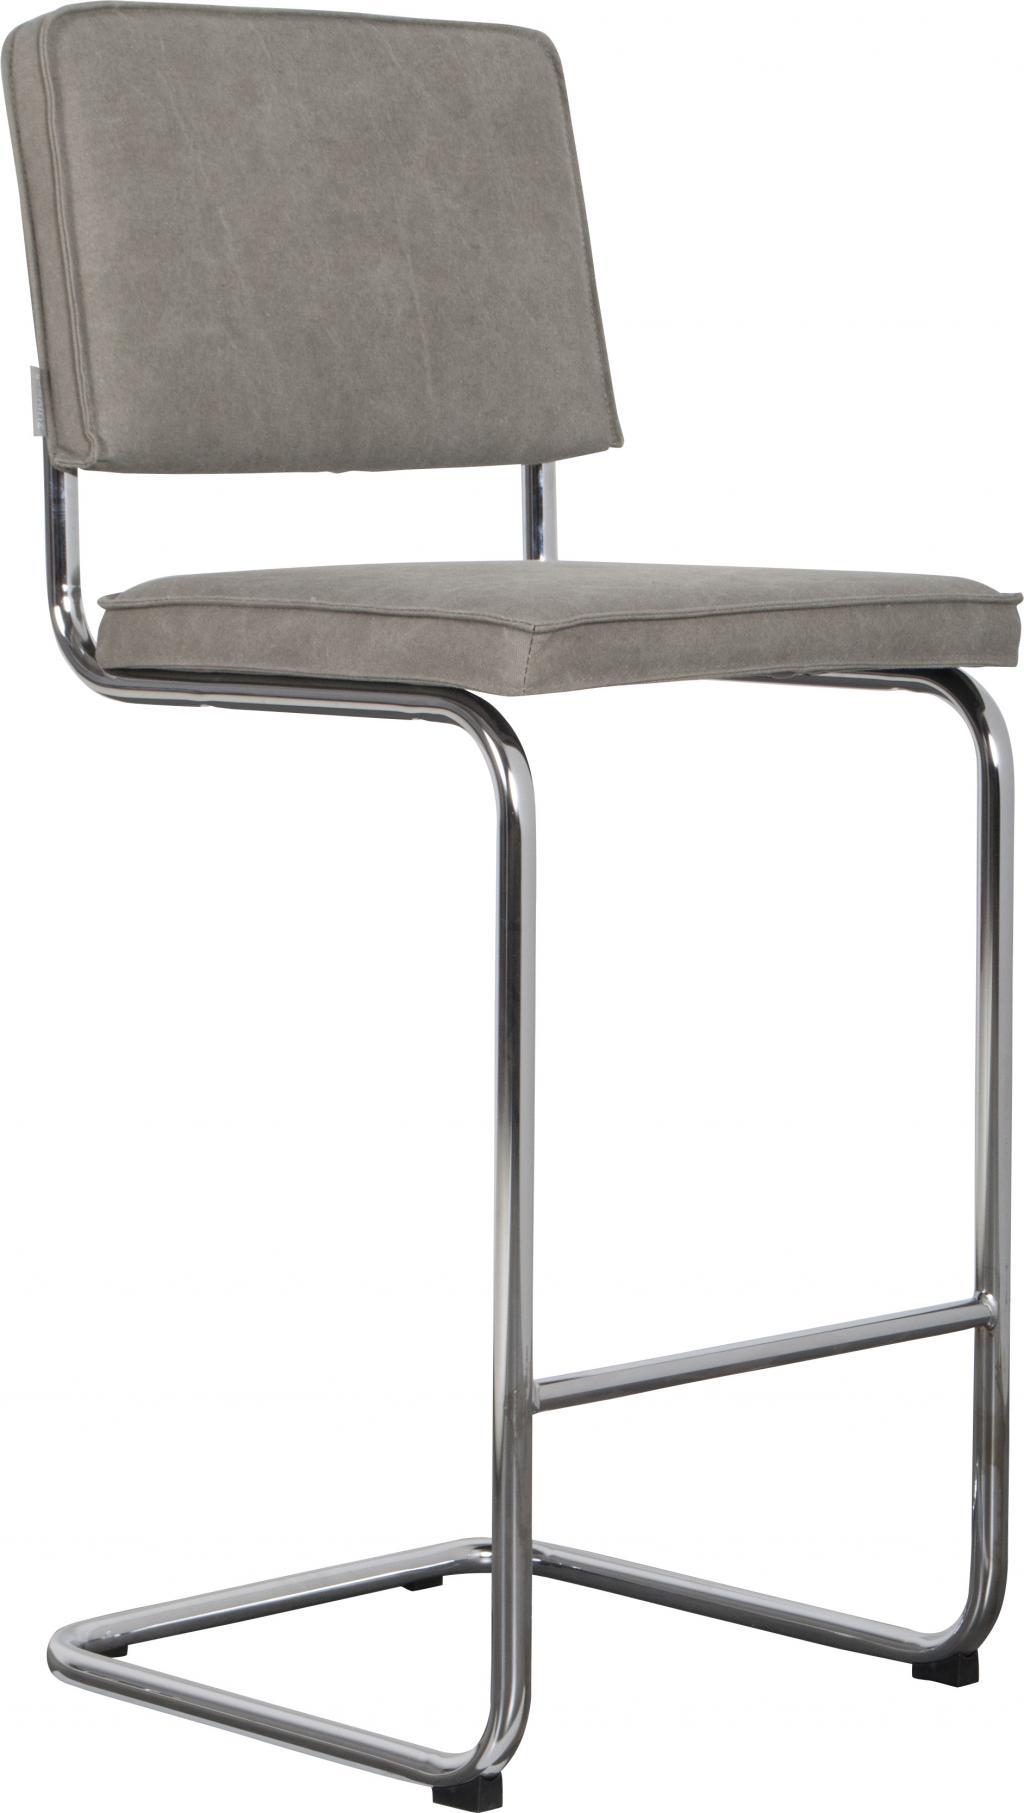 Hoker Ridge Vintage Grey - Green - 1500024